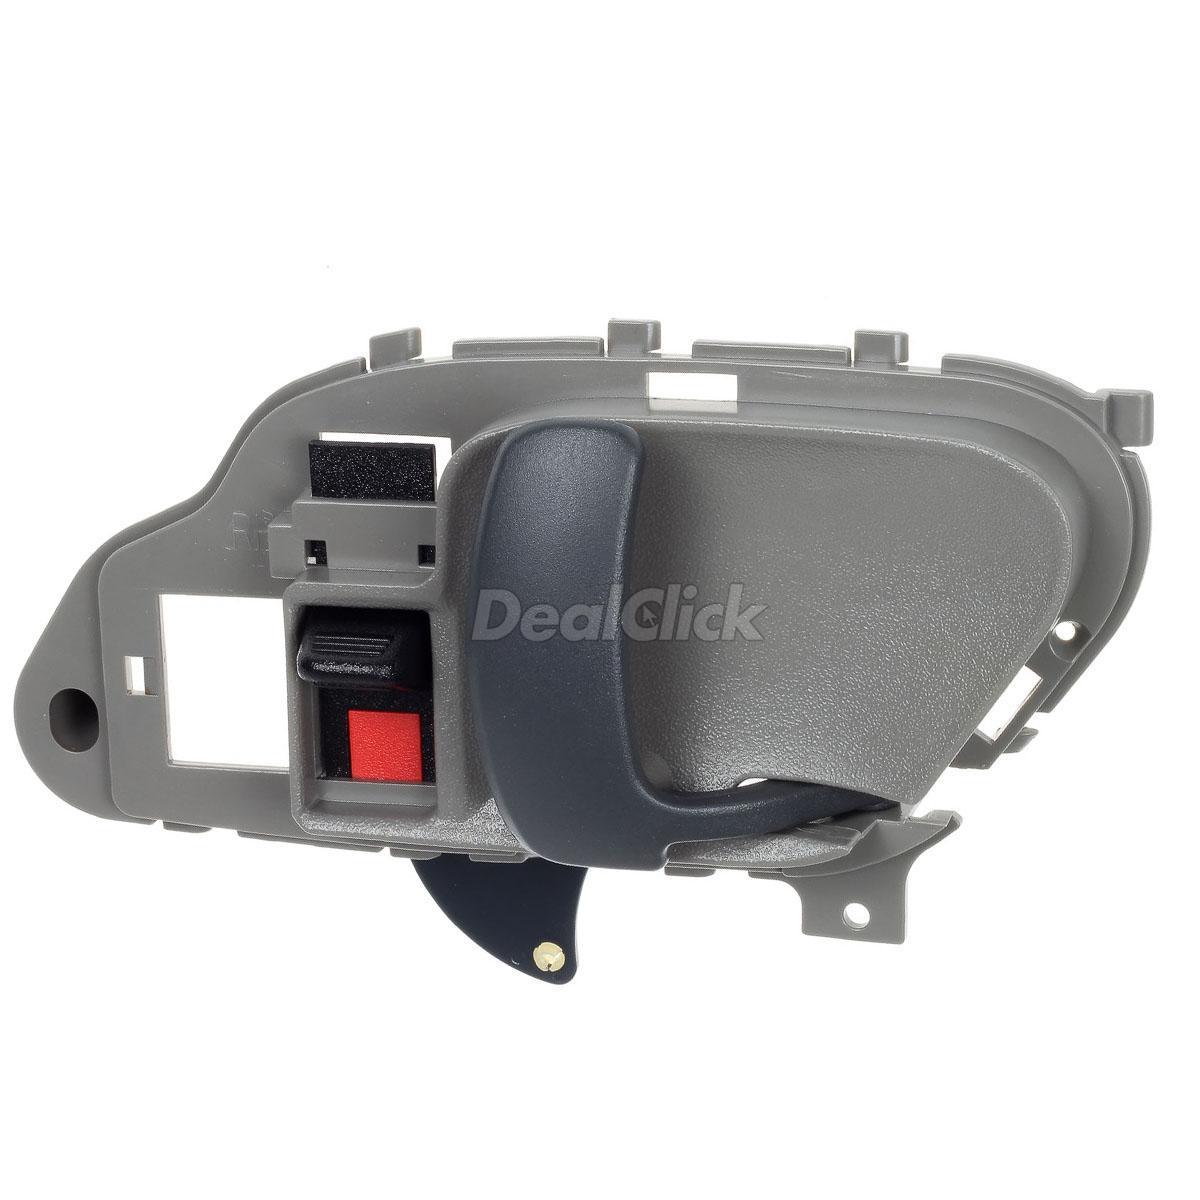 AUTEX Door Handle 2pcs Grey Interior Door Handle Front//Rear Left Right Compatible with GMC C1500 Pickup//Suburban 1995-1999 Replacement for GMC C2500 Pickup//Suburban 1995-1999 Compatible with GMC K3500